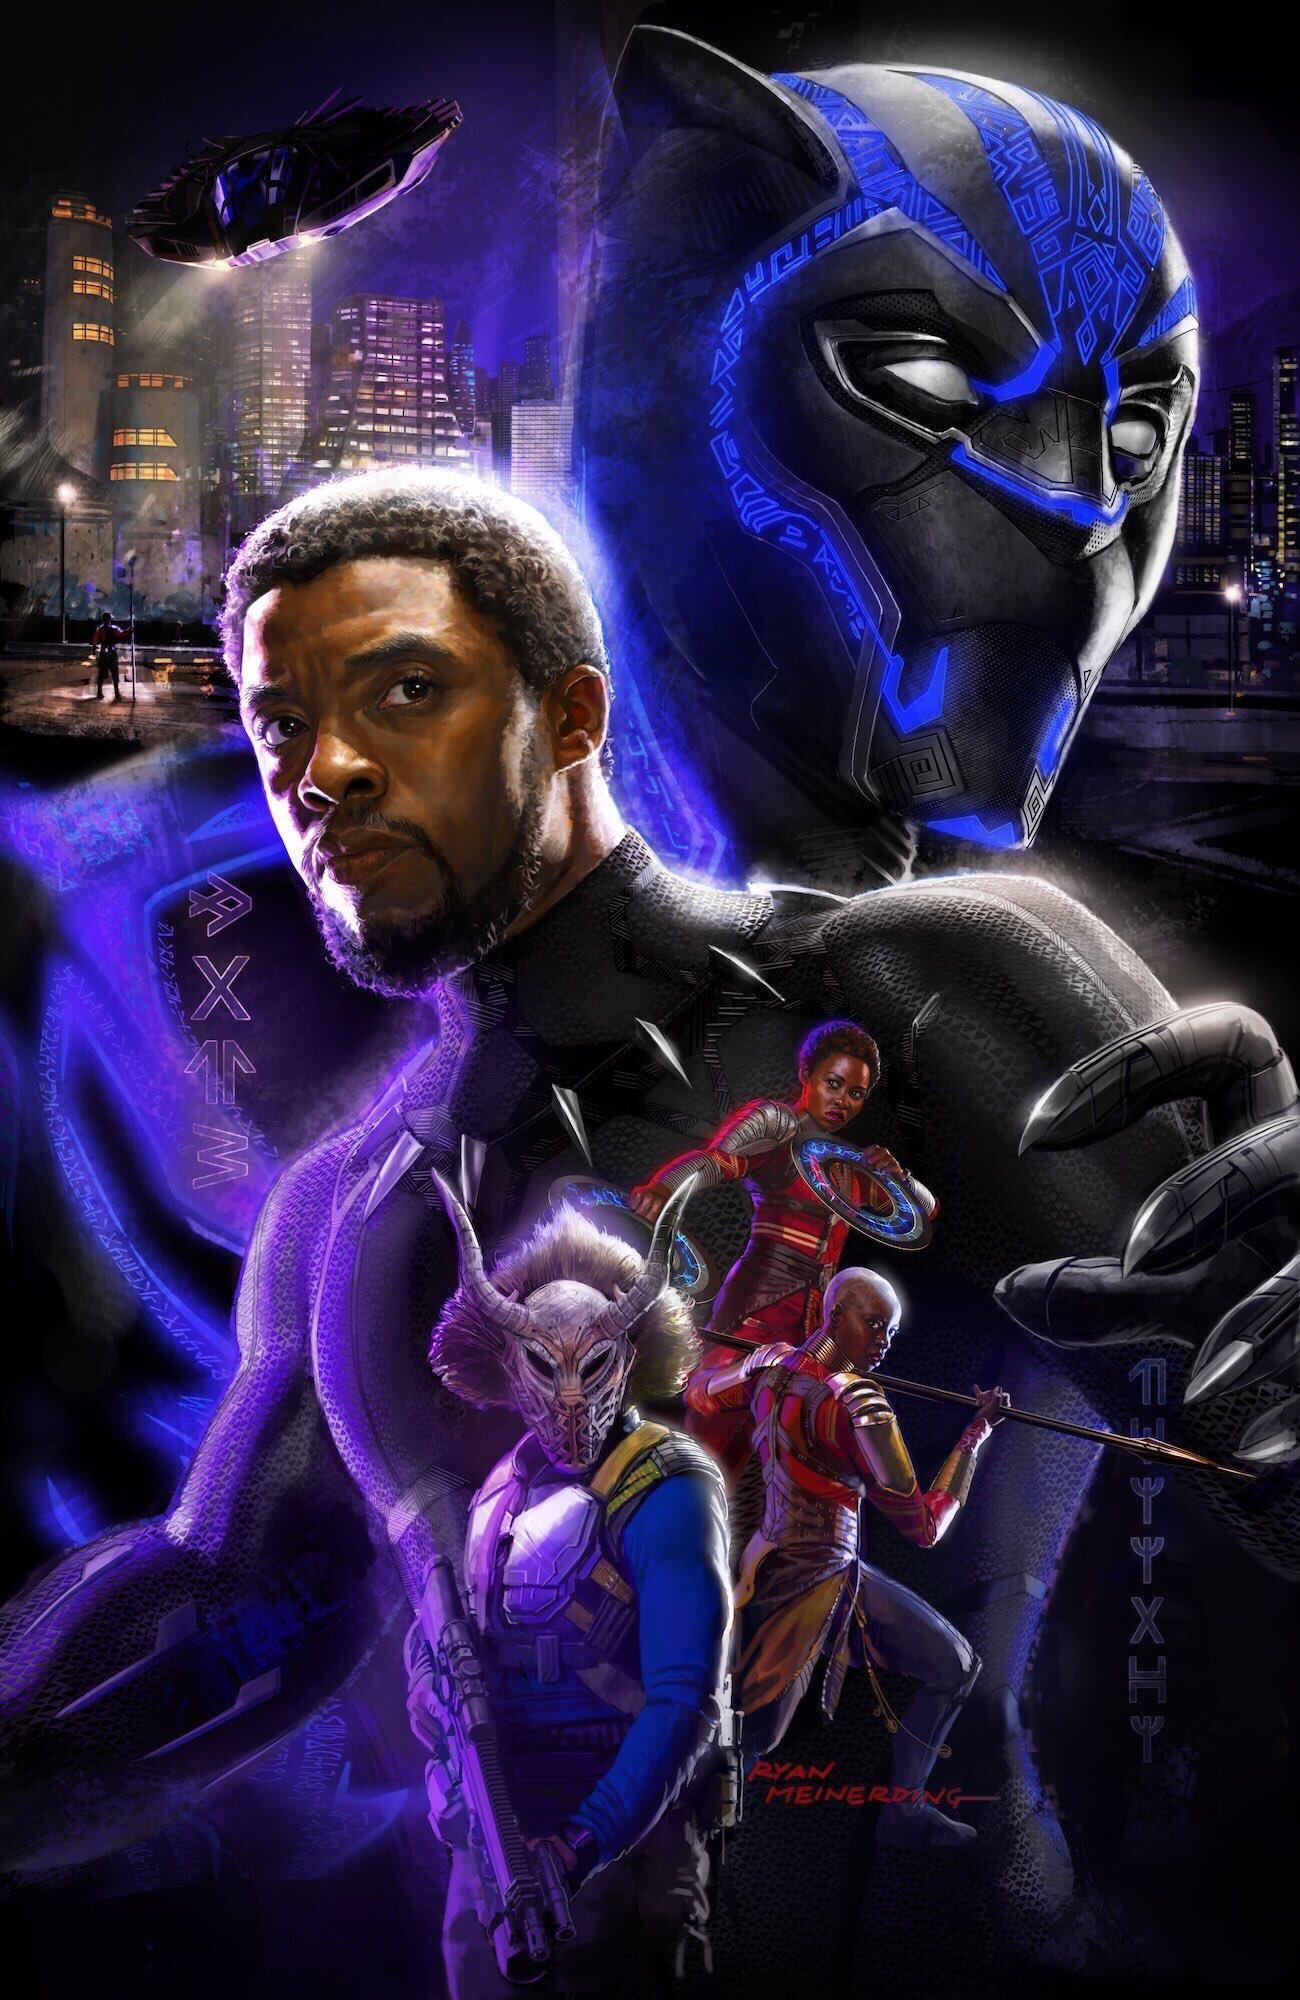 Warrior Falls Mcu Wallpaper Full Black Panther Poster Marvel